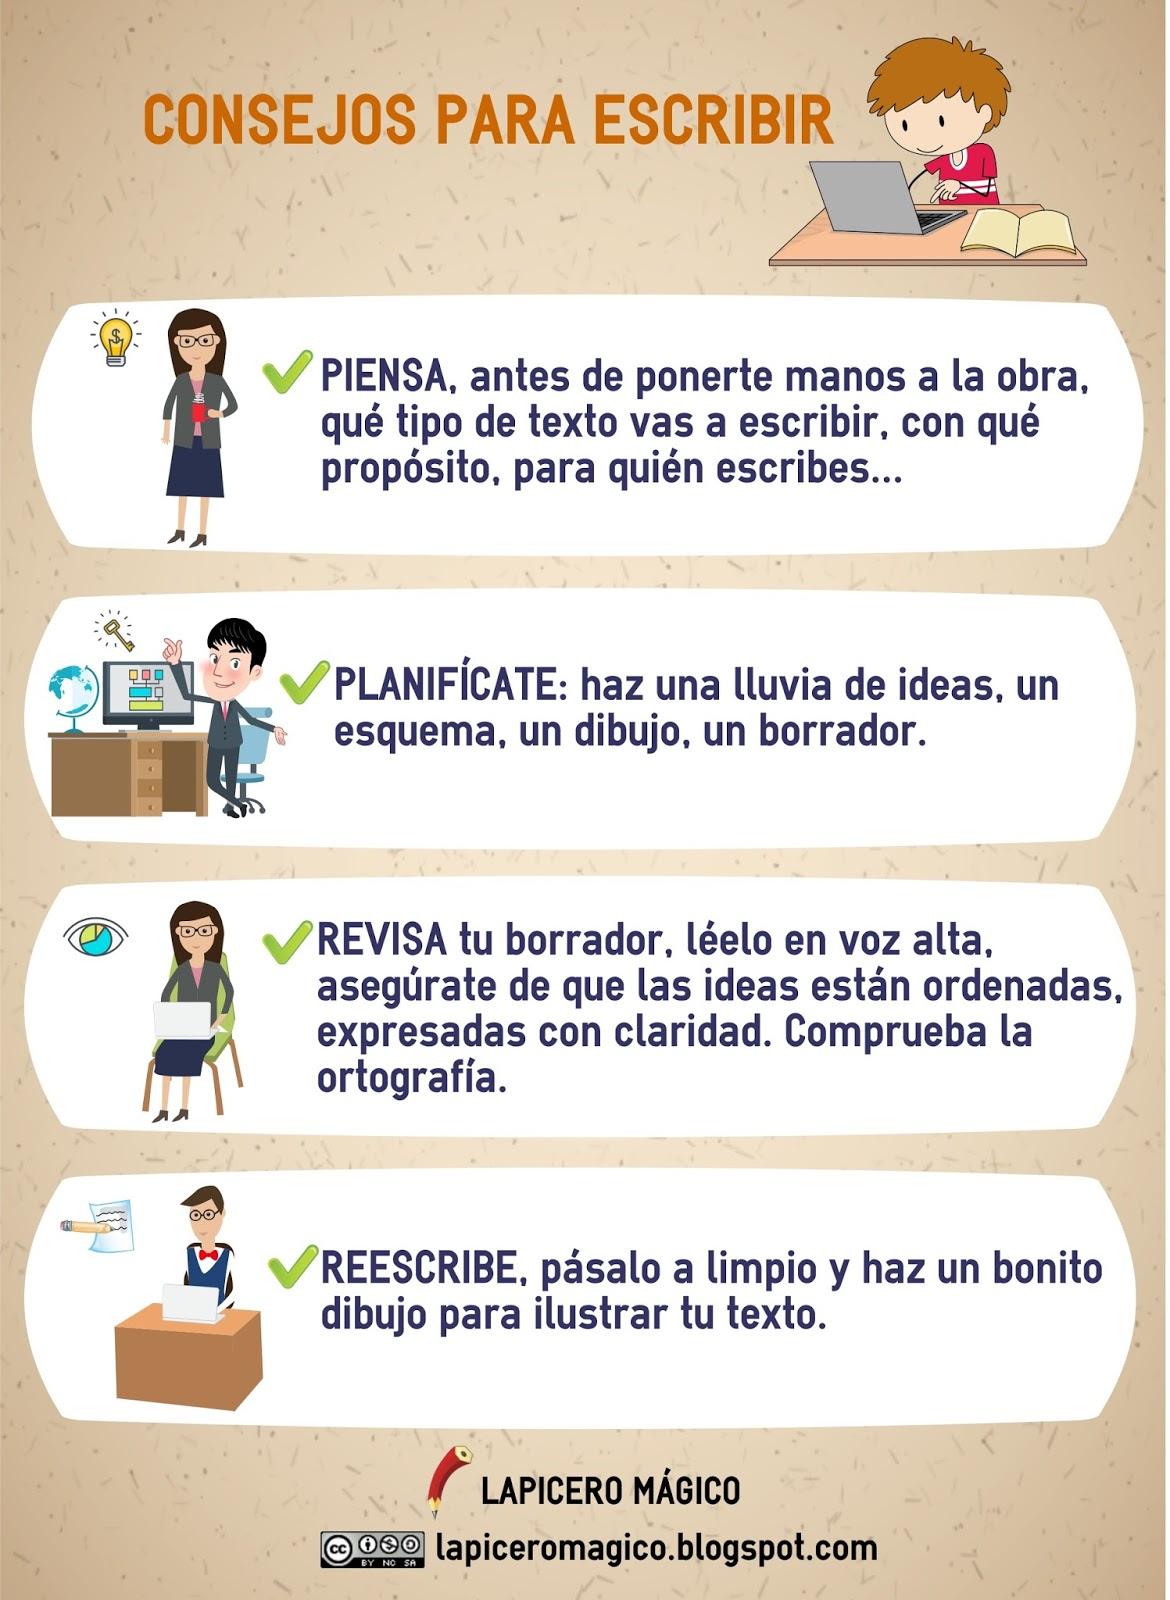 LAPICERO MÁGICO: Infografía Consejos para escribir - photo#6